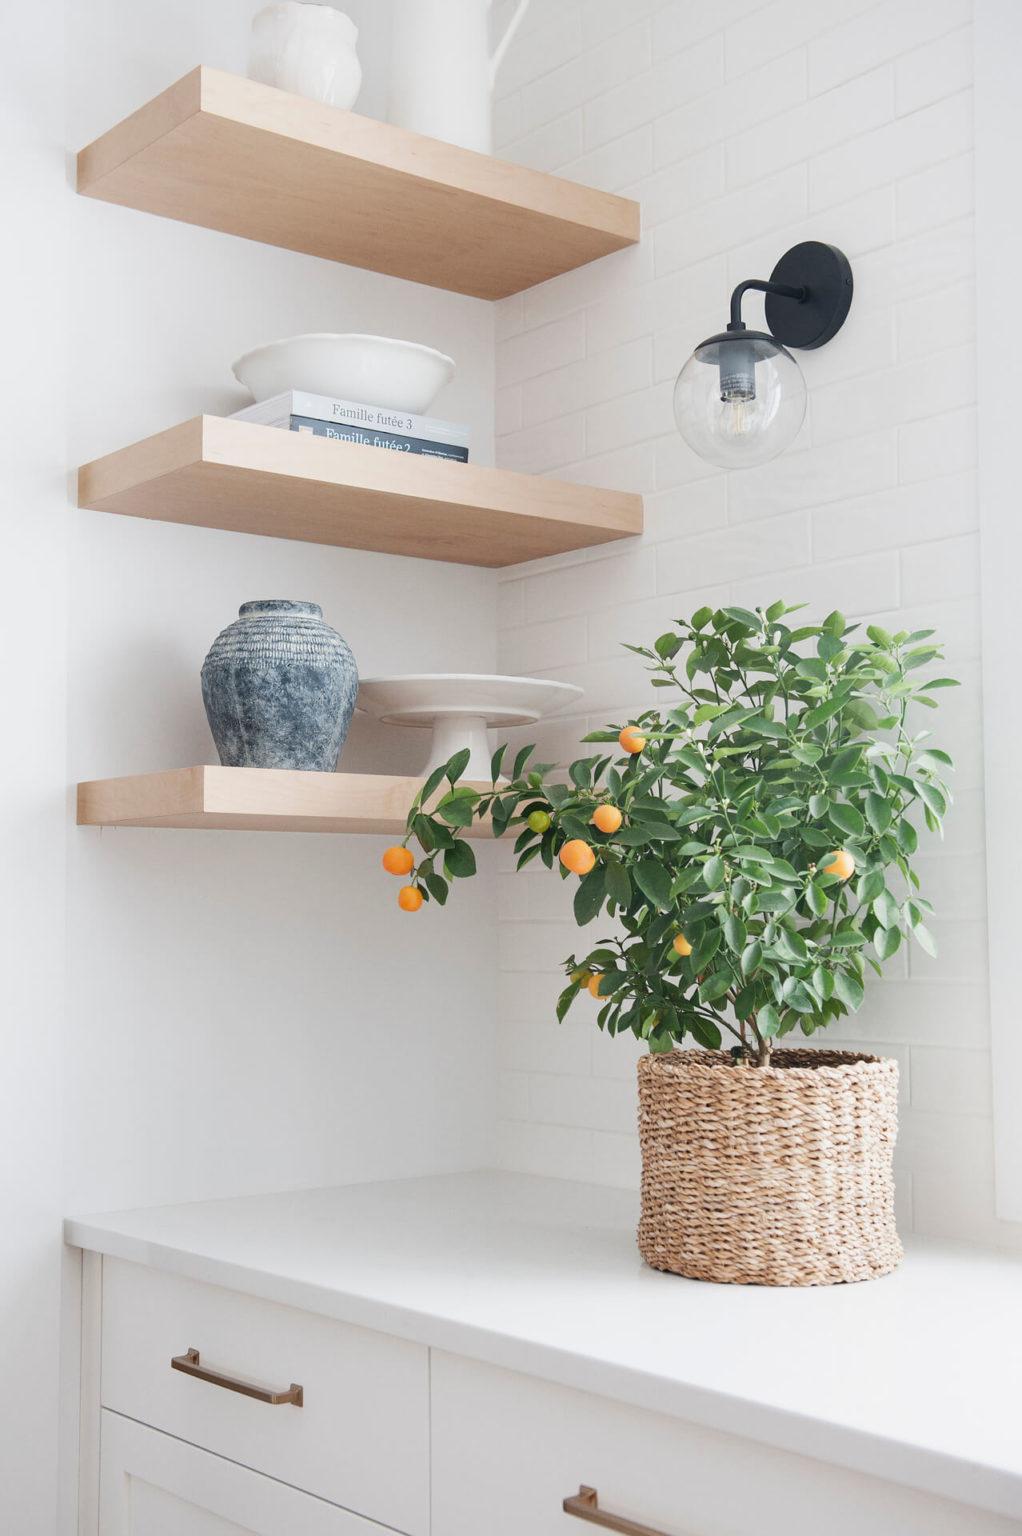 AKB Design cuisine blanche armoire noire poignee laiton comptoir quartz garde manger 11